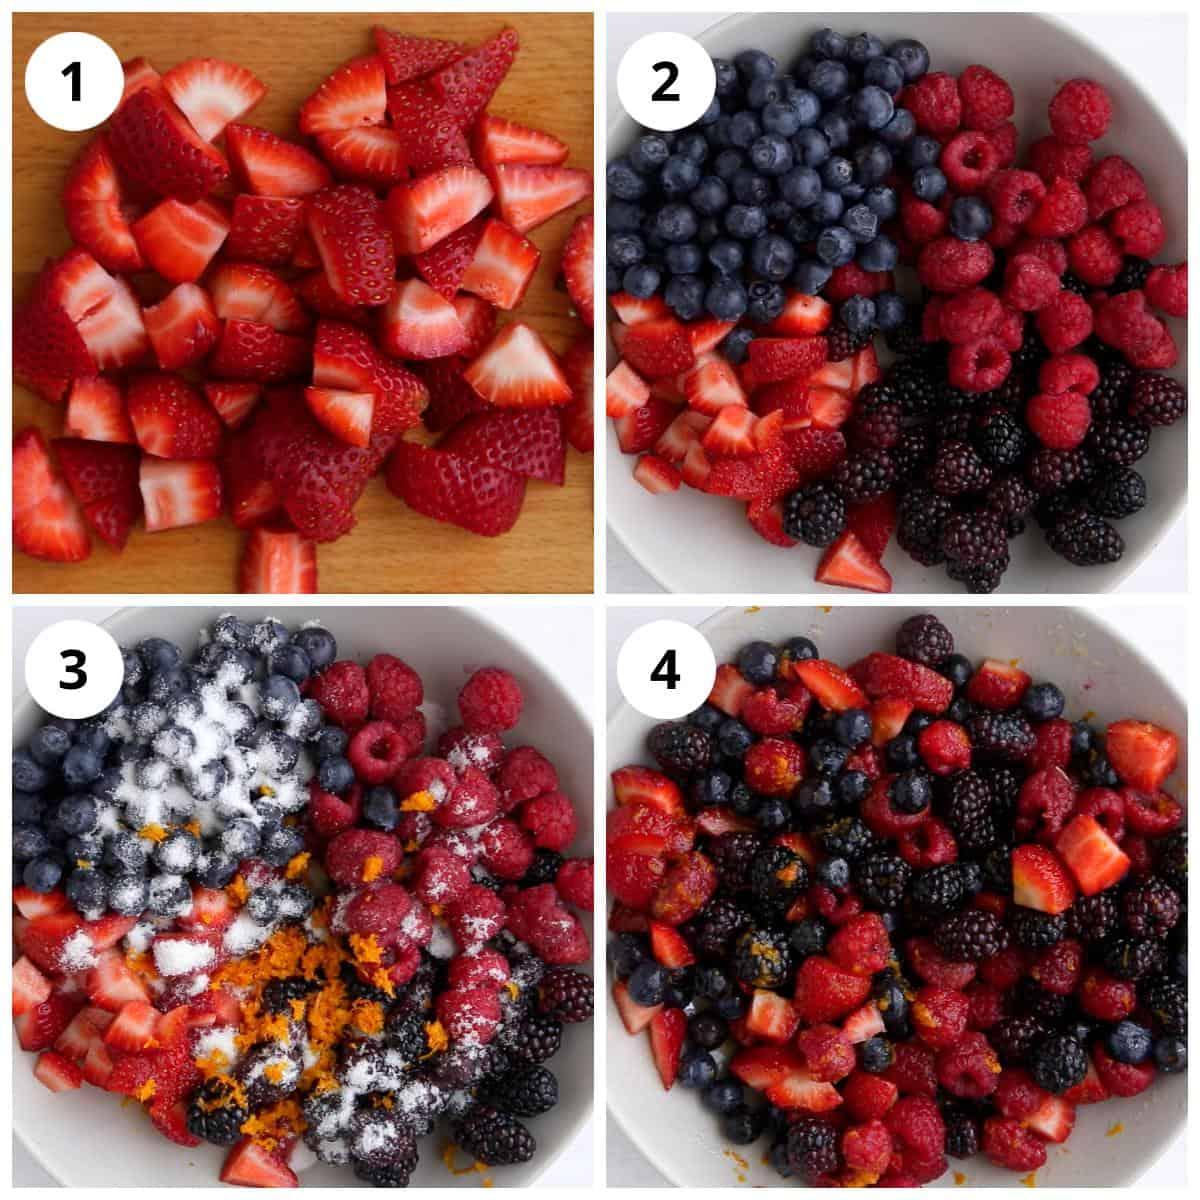 Steps for Macerating Berries